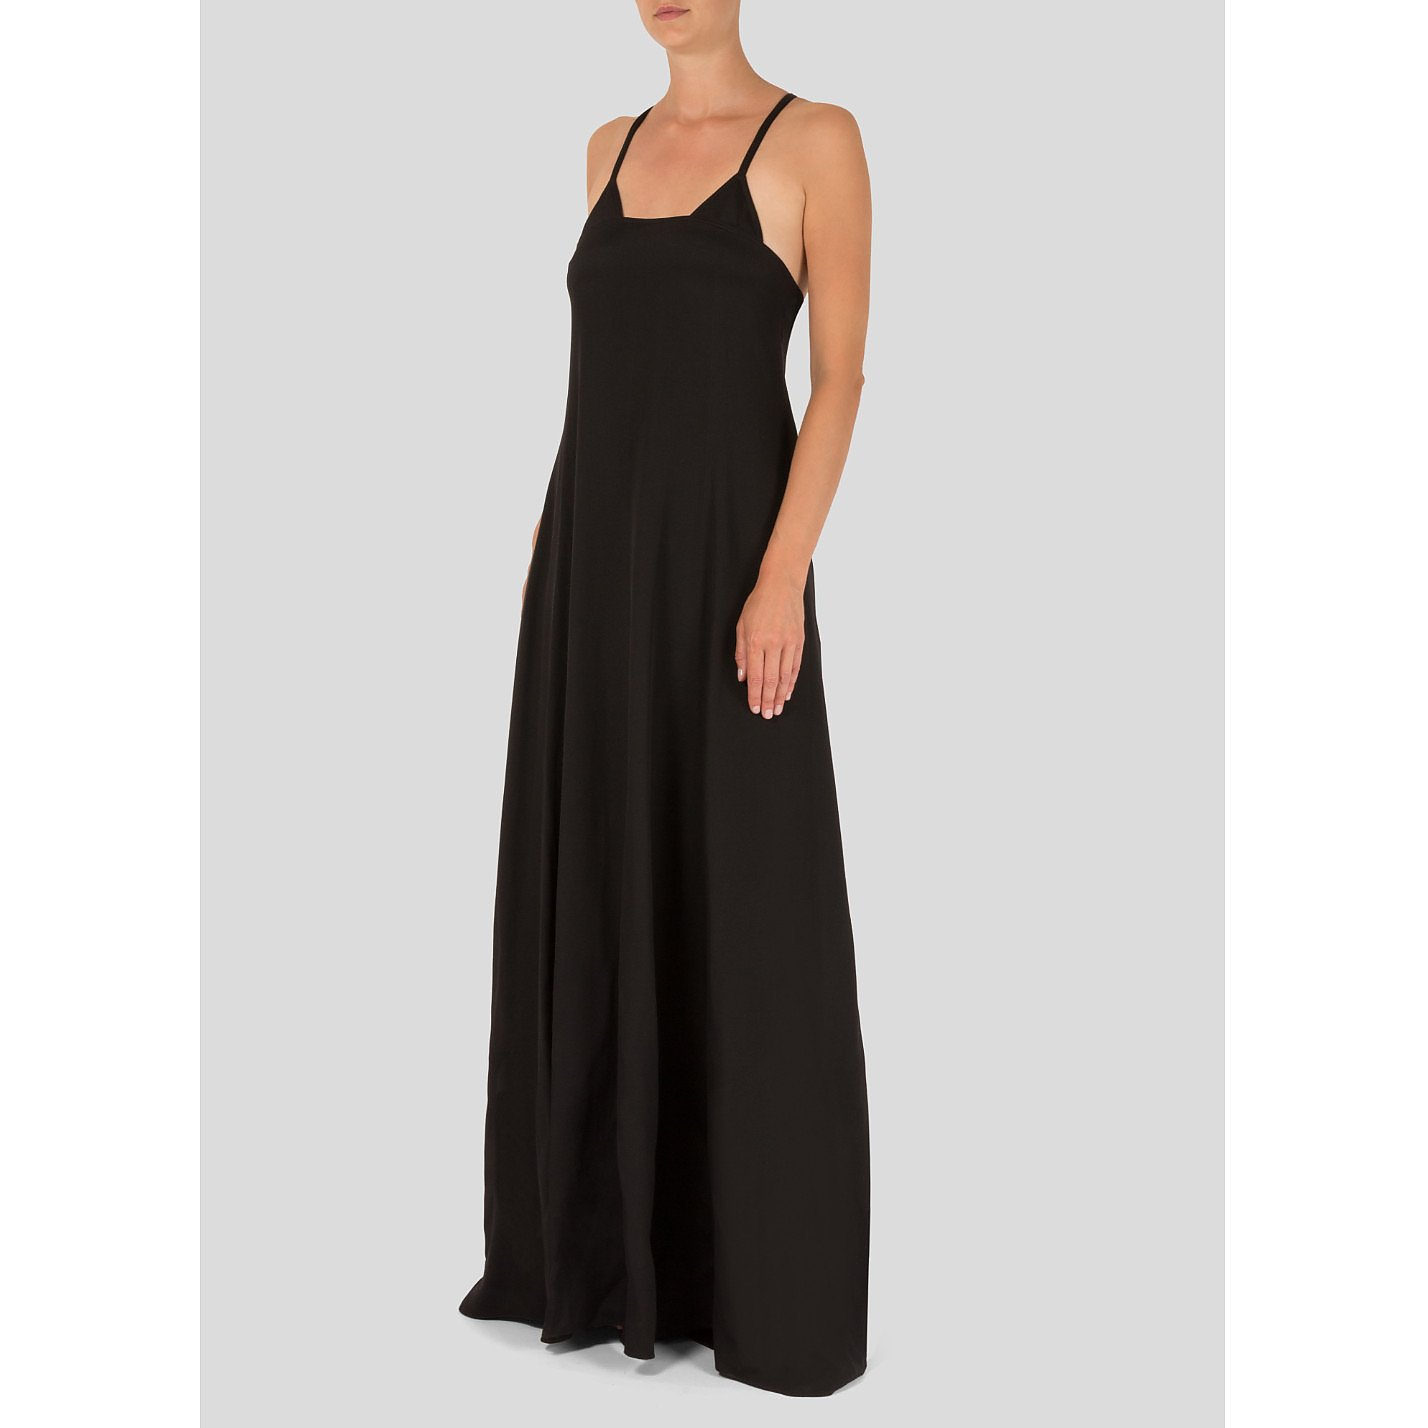 Valentino Strappy Gown